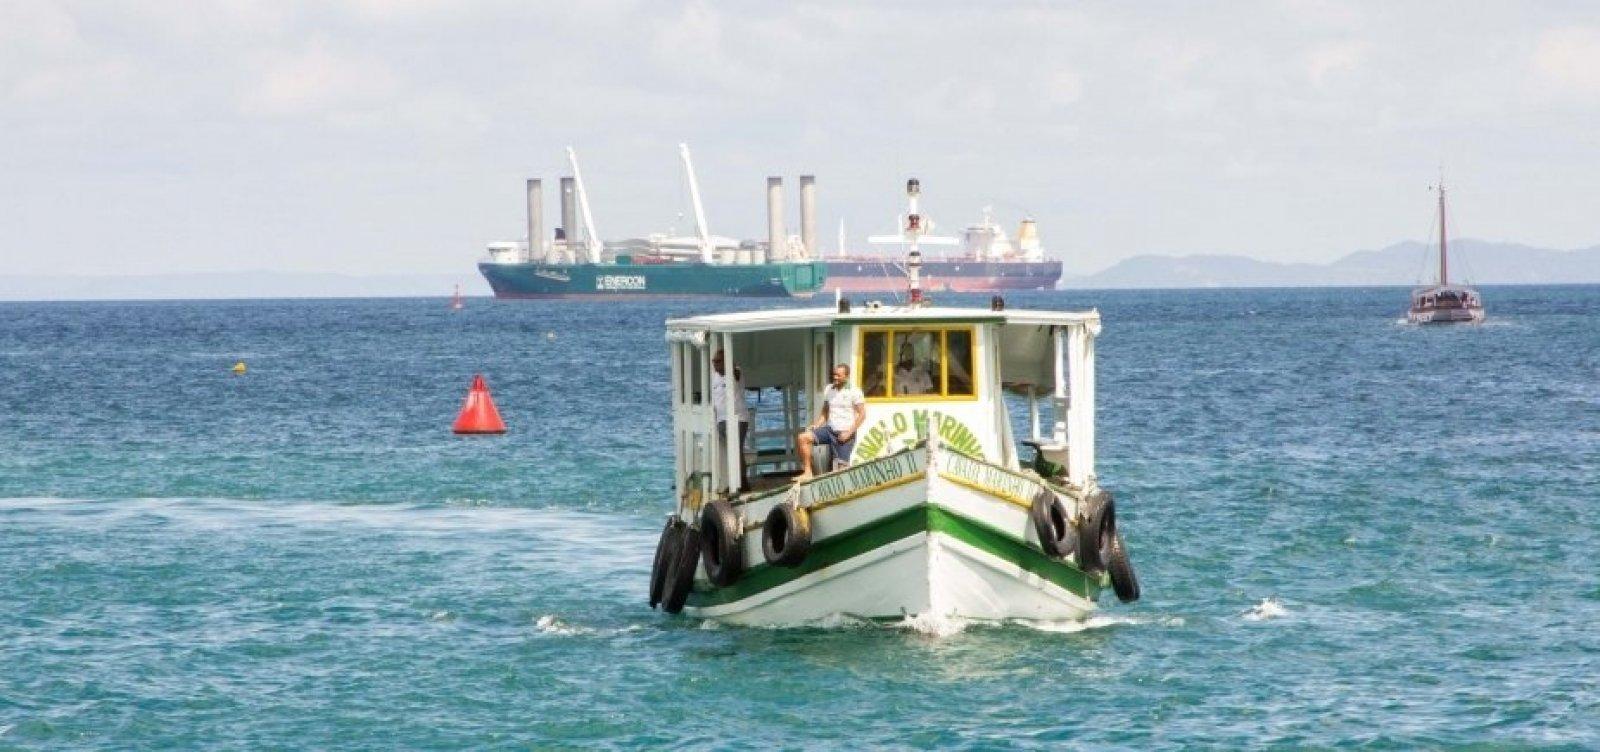 Maré baixa interrompe travessia de lanchas entre Salvador e Mar Grande